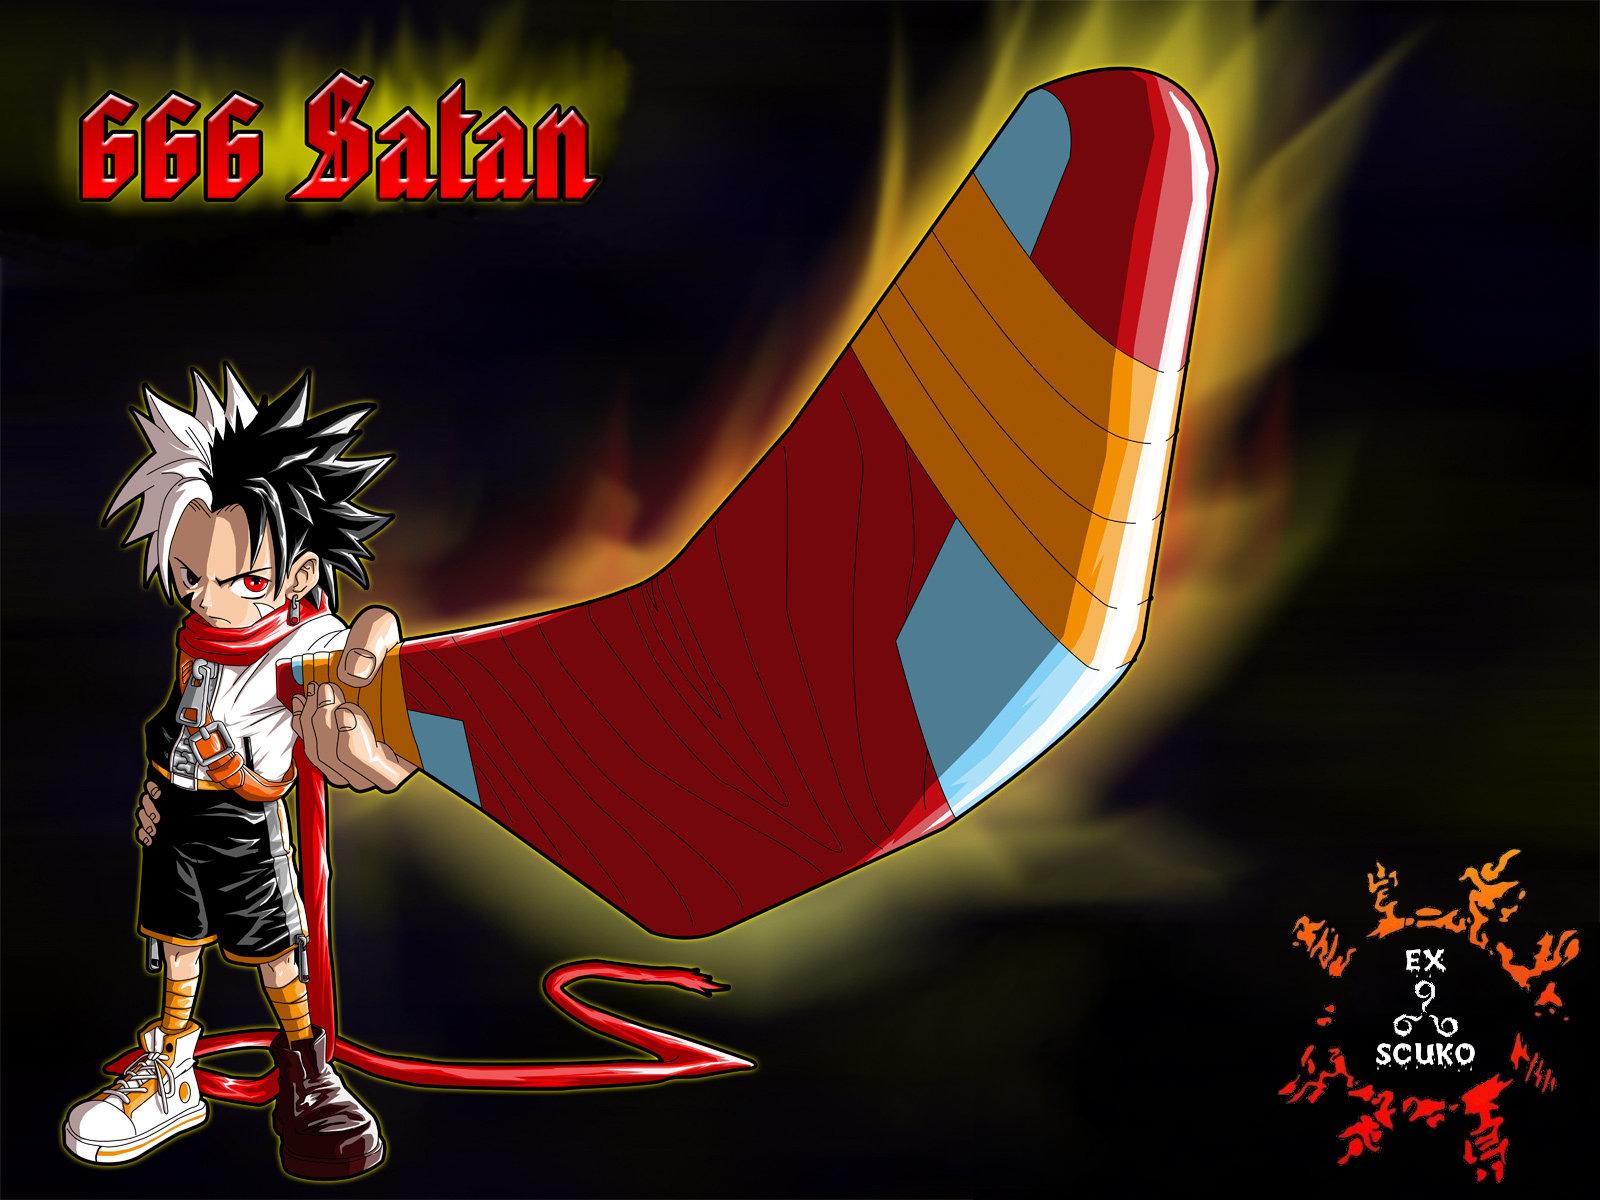 Манга Онлайн - 666 Satan / 666 Сатана 10 # 38 Настоящий монстр 2 - Страница №1 - 666 Satan